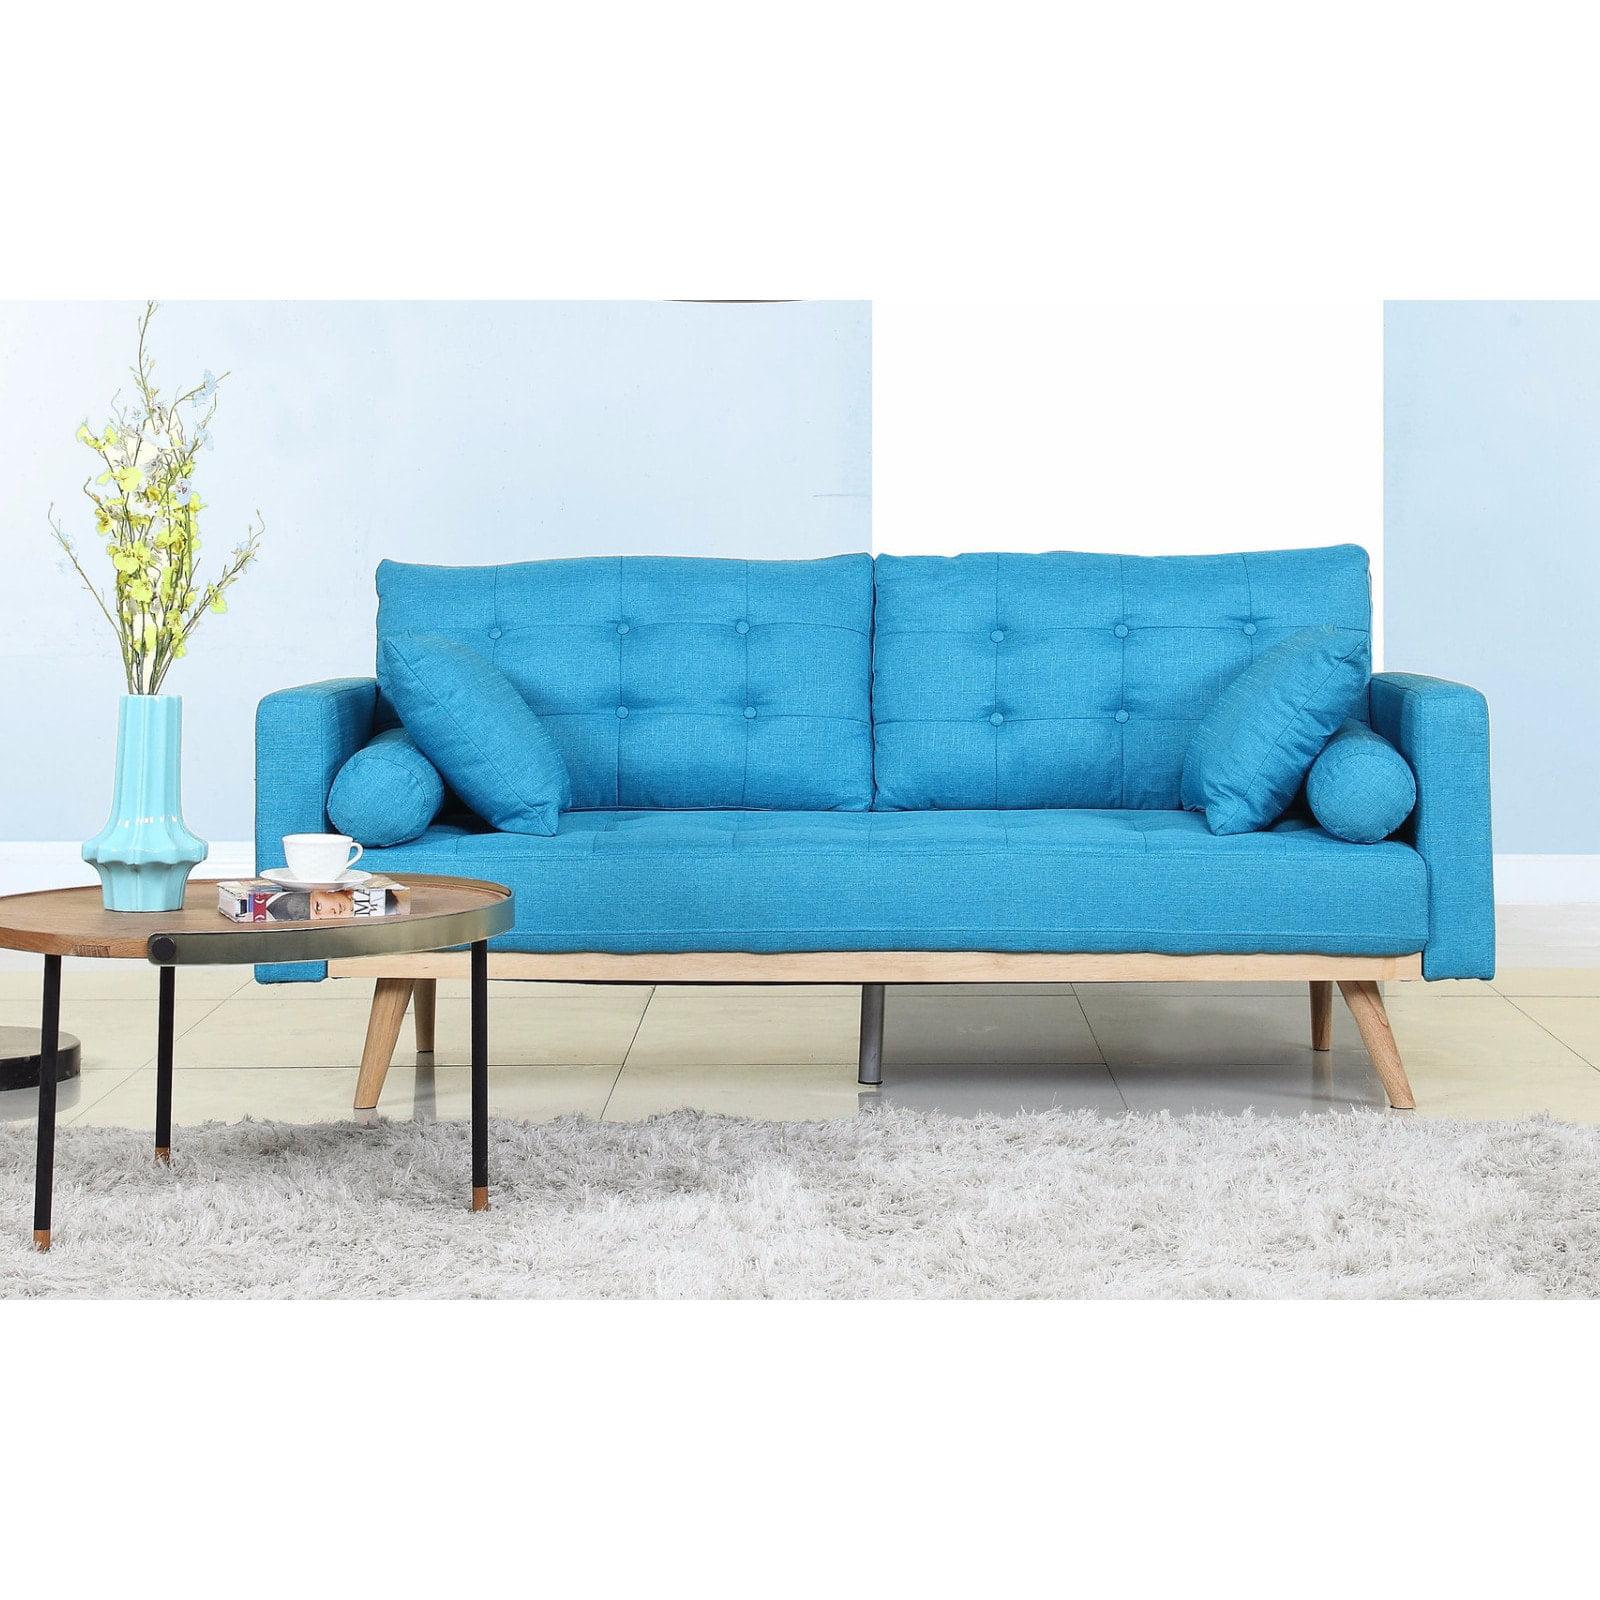 Madison Home Tufted Linen Mid-century Modern Sofa - Walmart.com